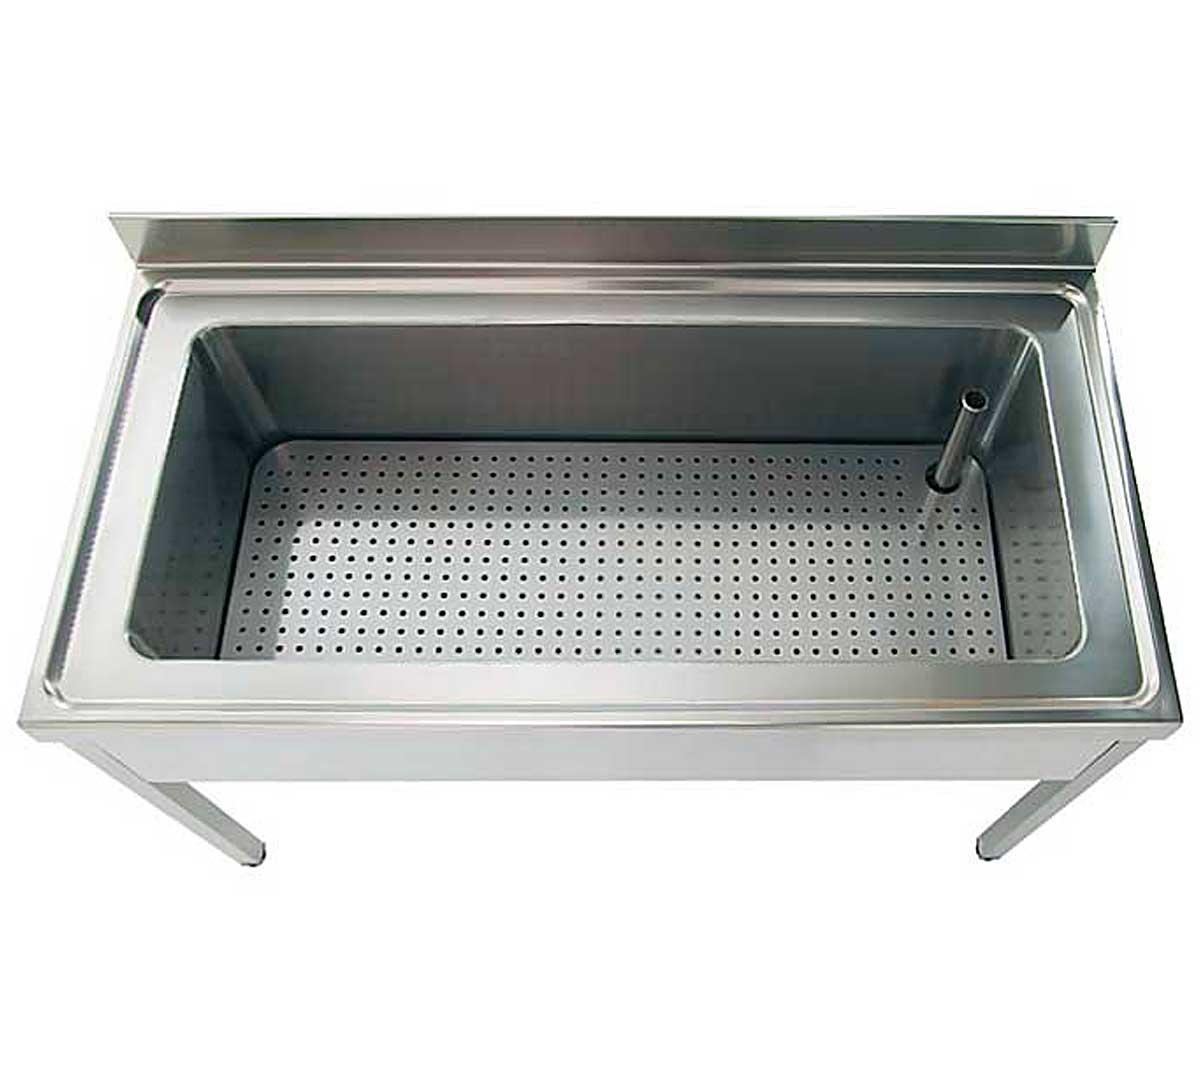 Comprar ofertas platos de ducha muebles sofas spain for Fregaderos ikea